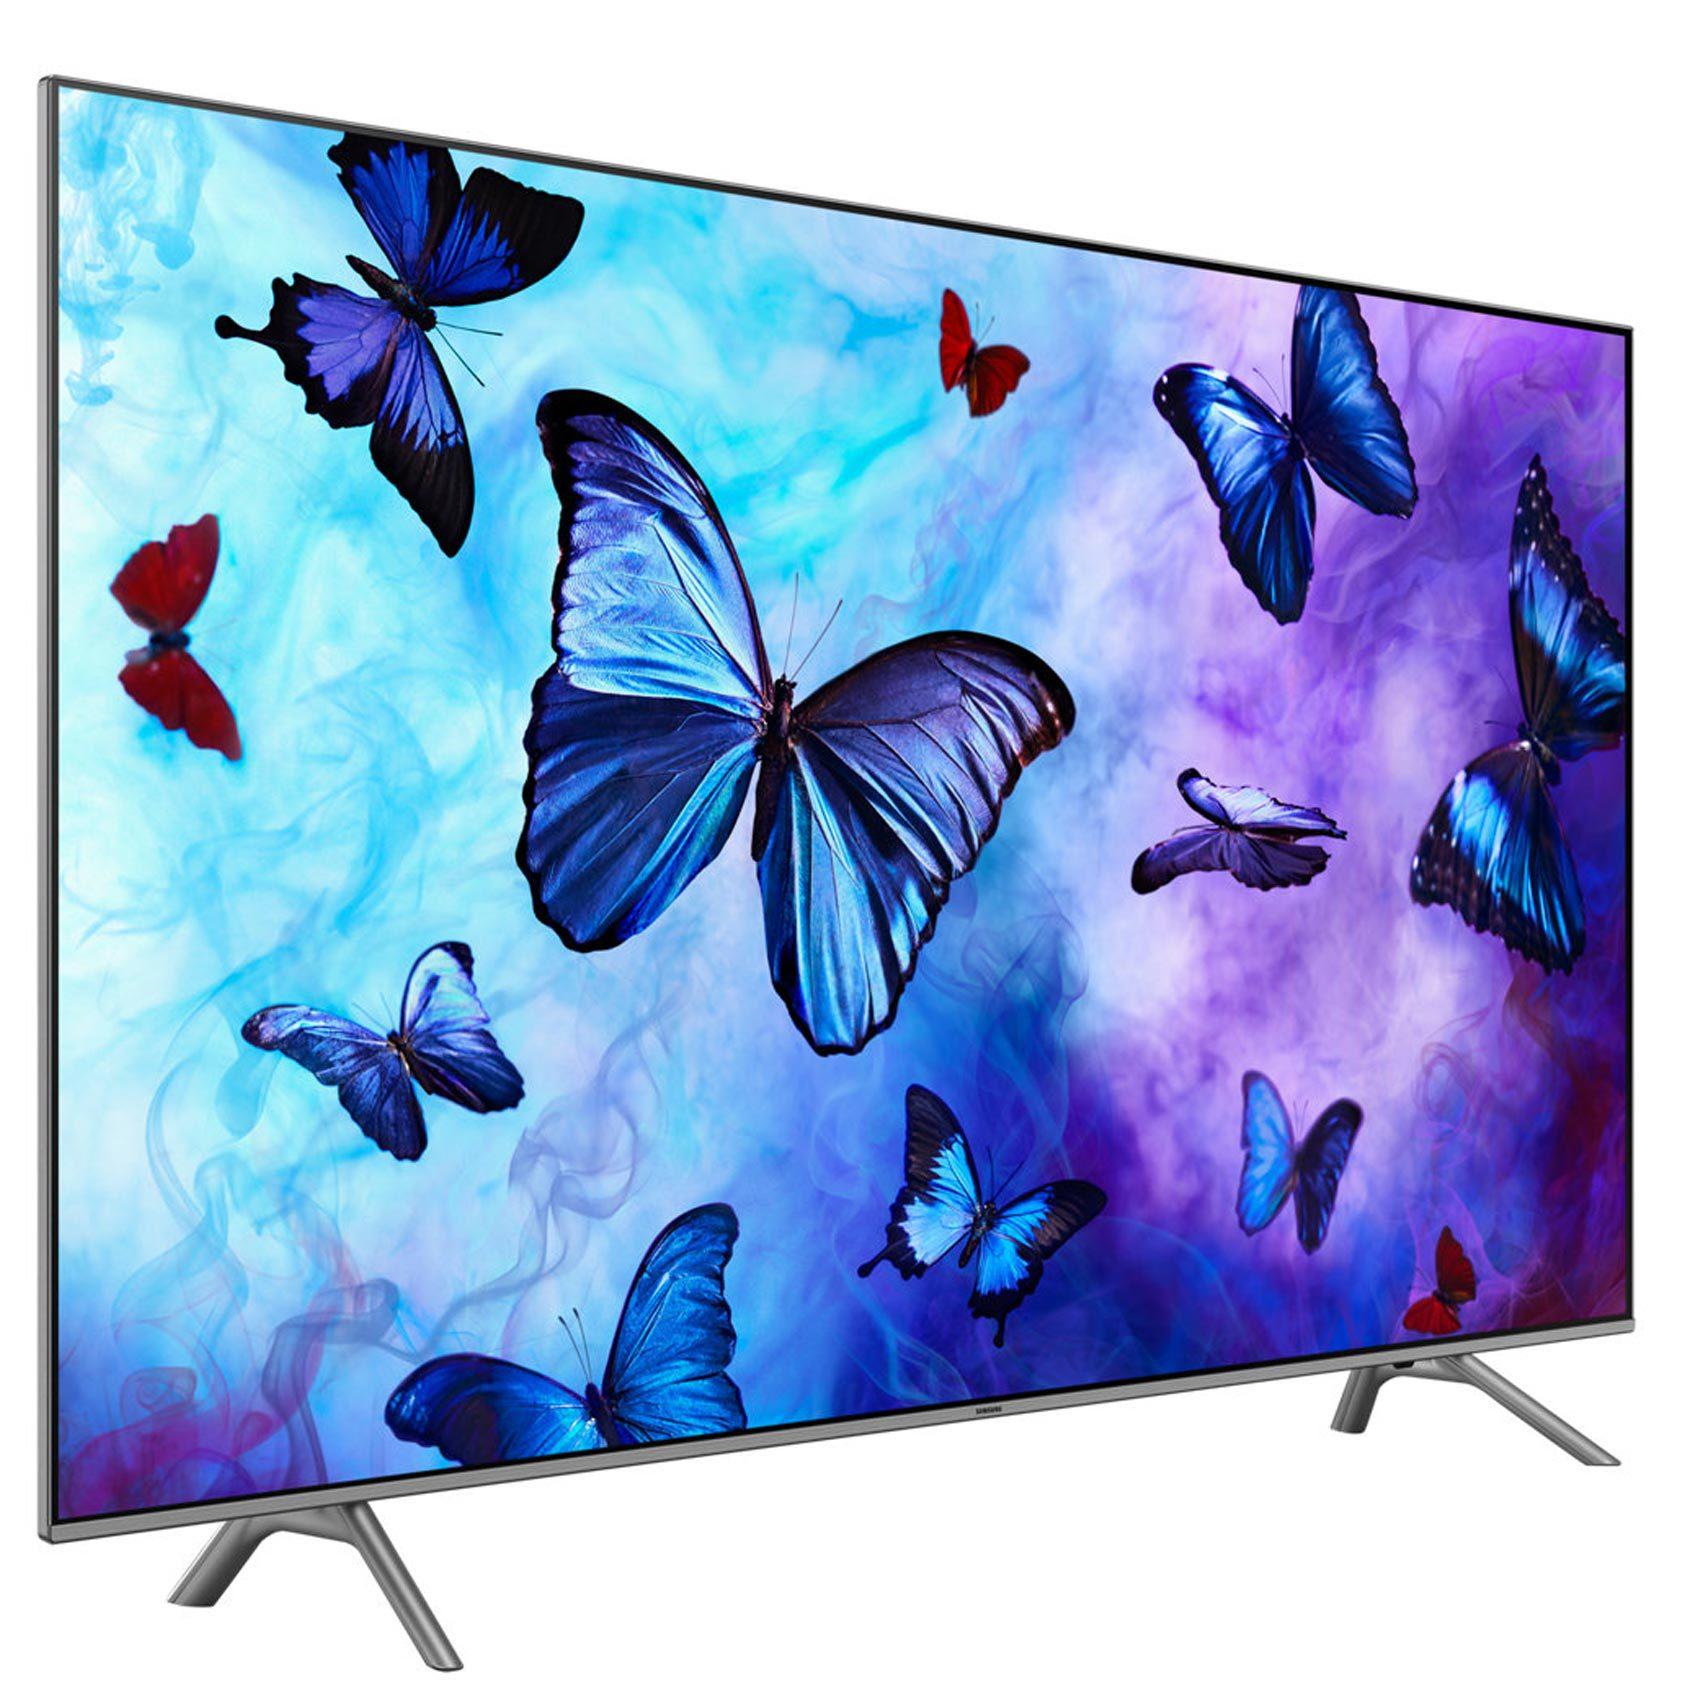 SAMSUNG QLED TV 65